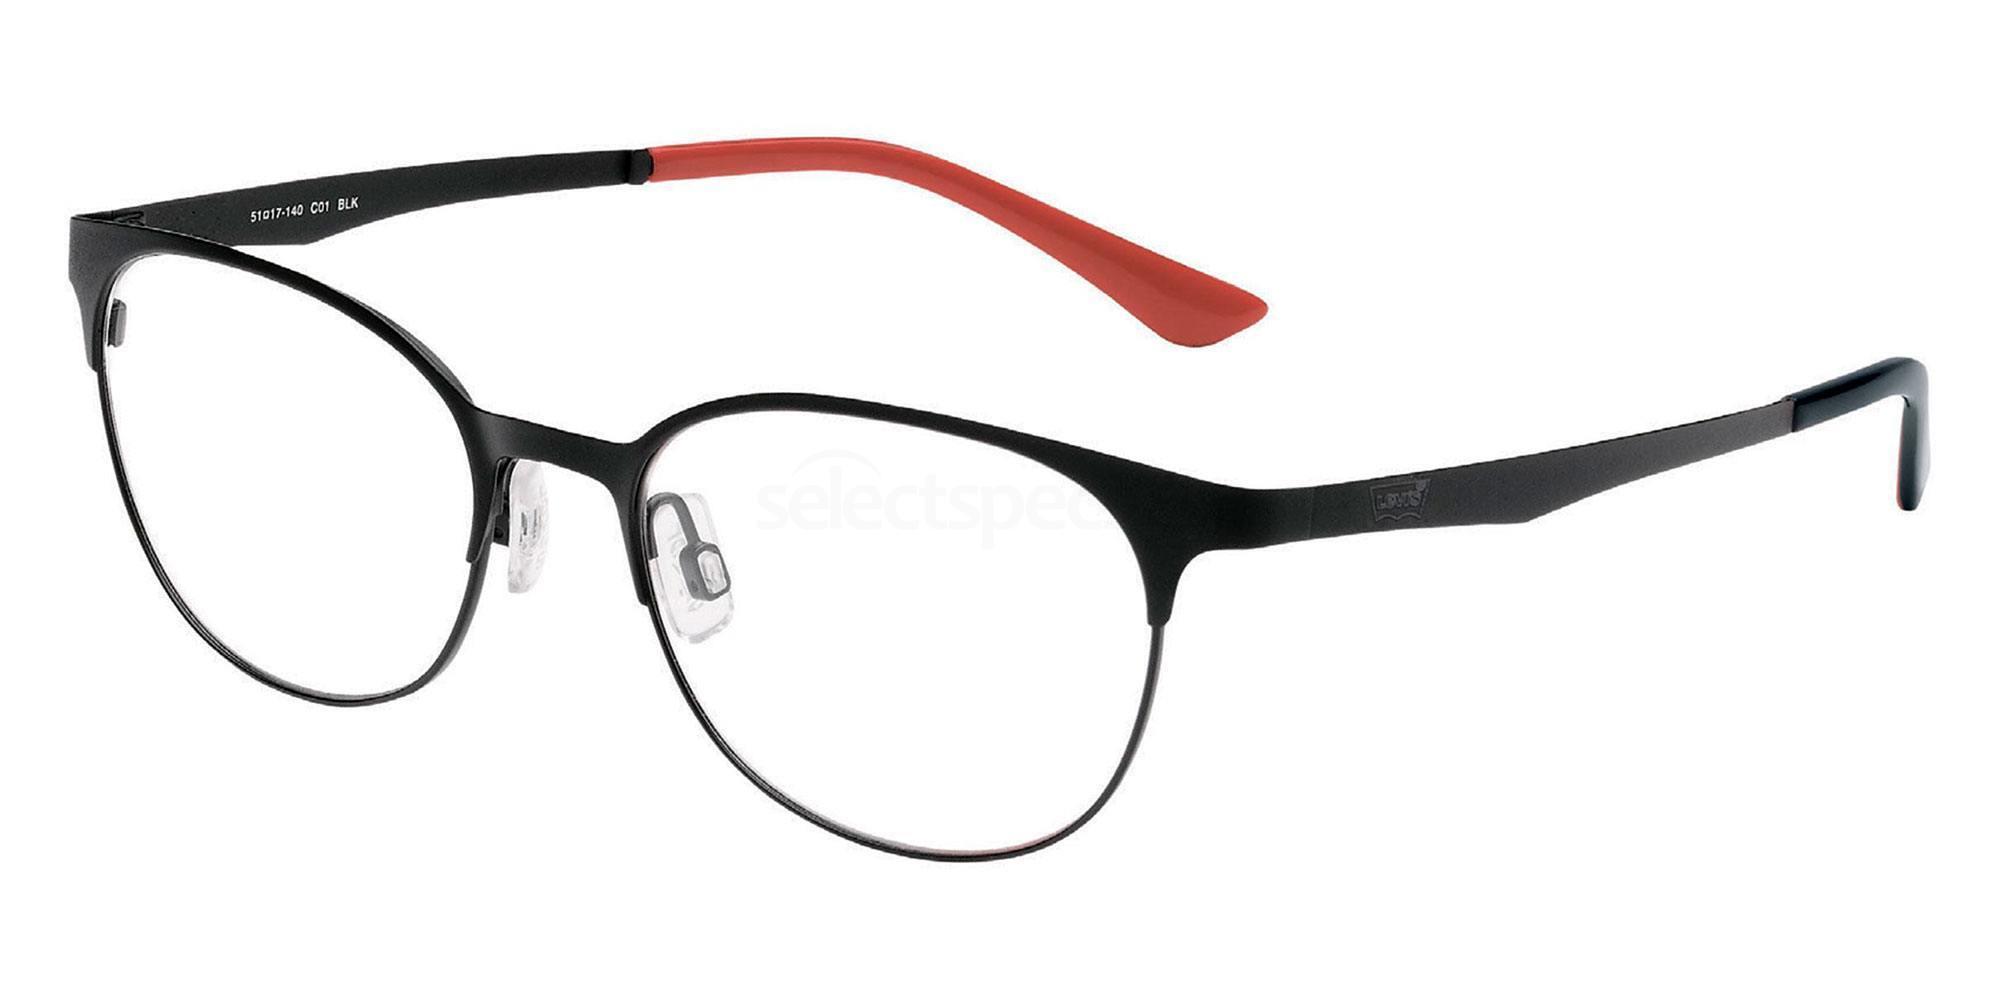 01 BLK LS105 Glasses, Levi's Eyewear